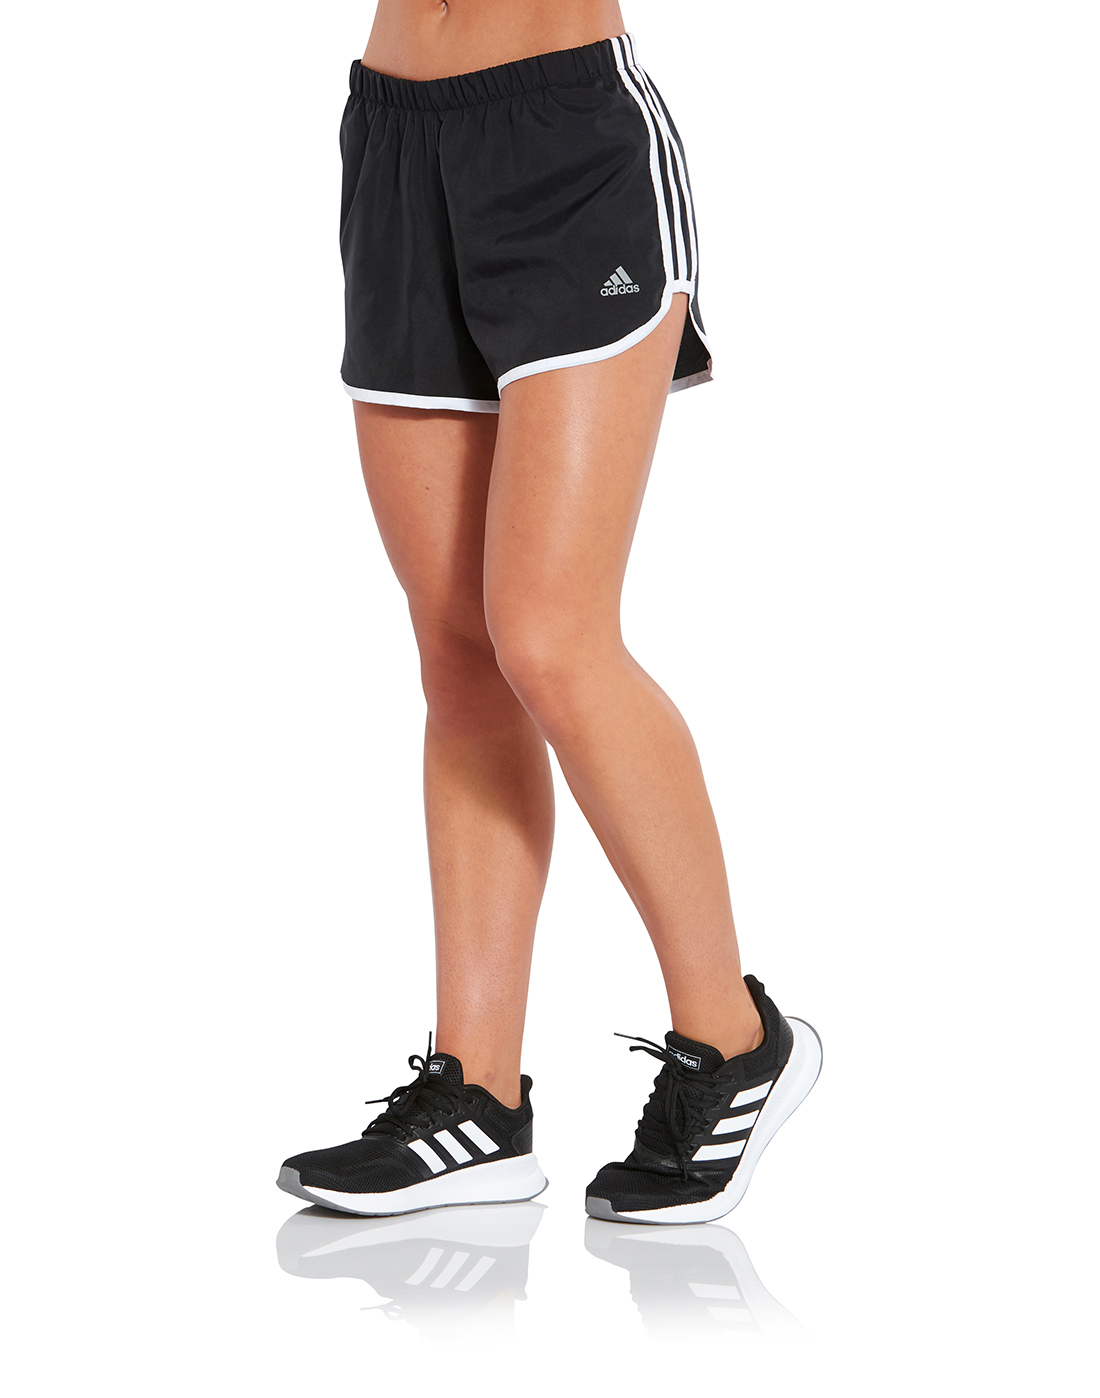 Women's Black adidas Marathon Shorts